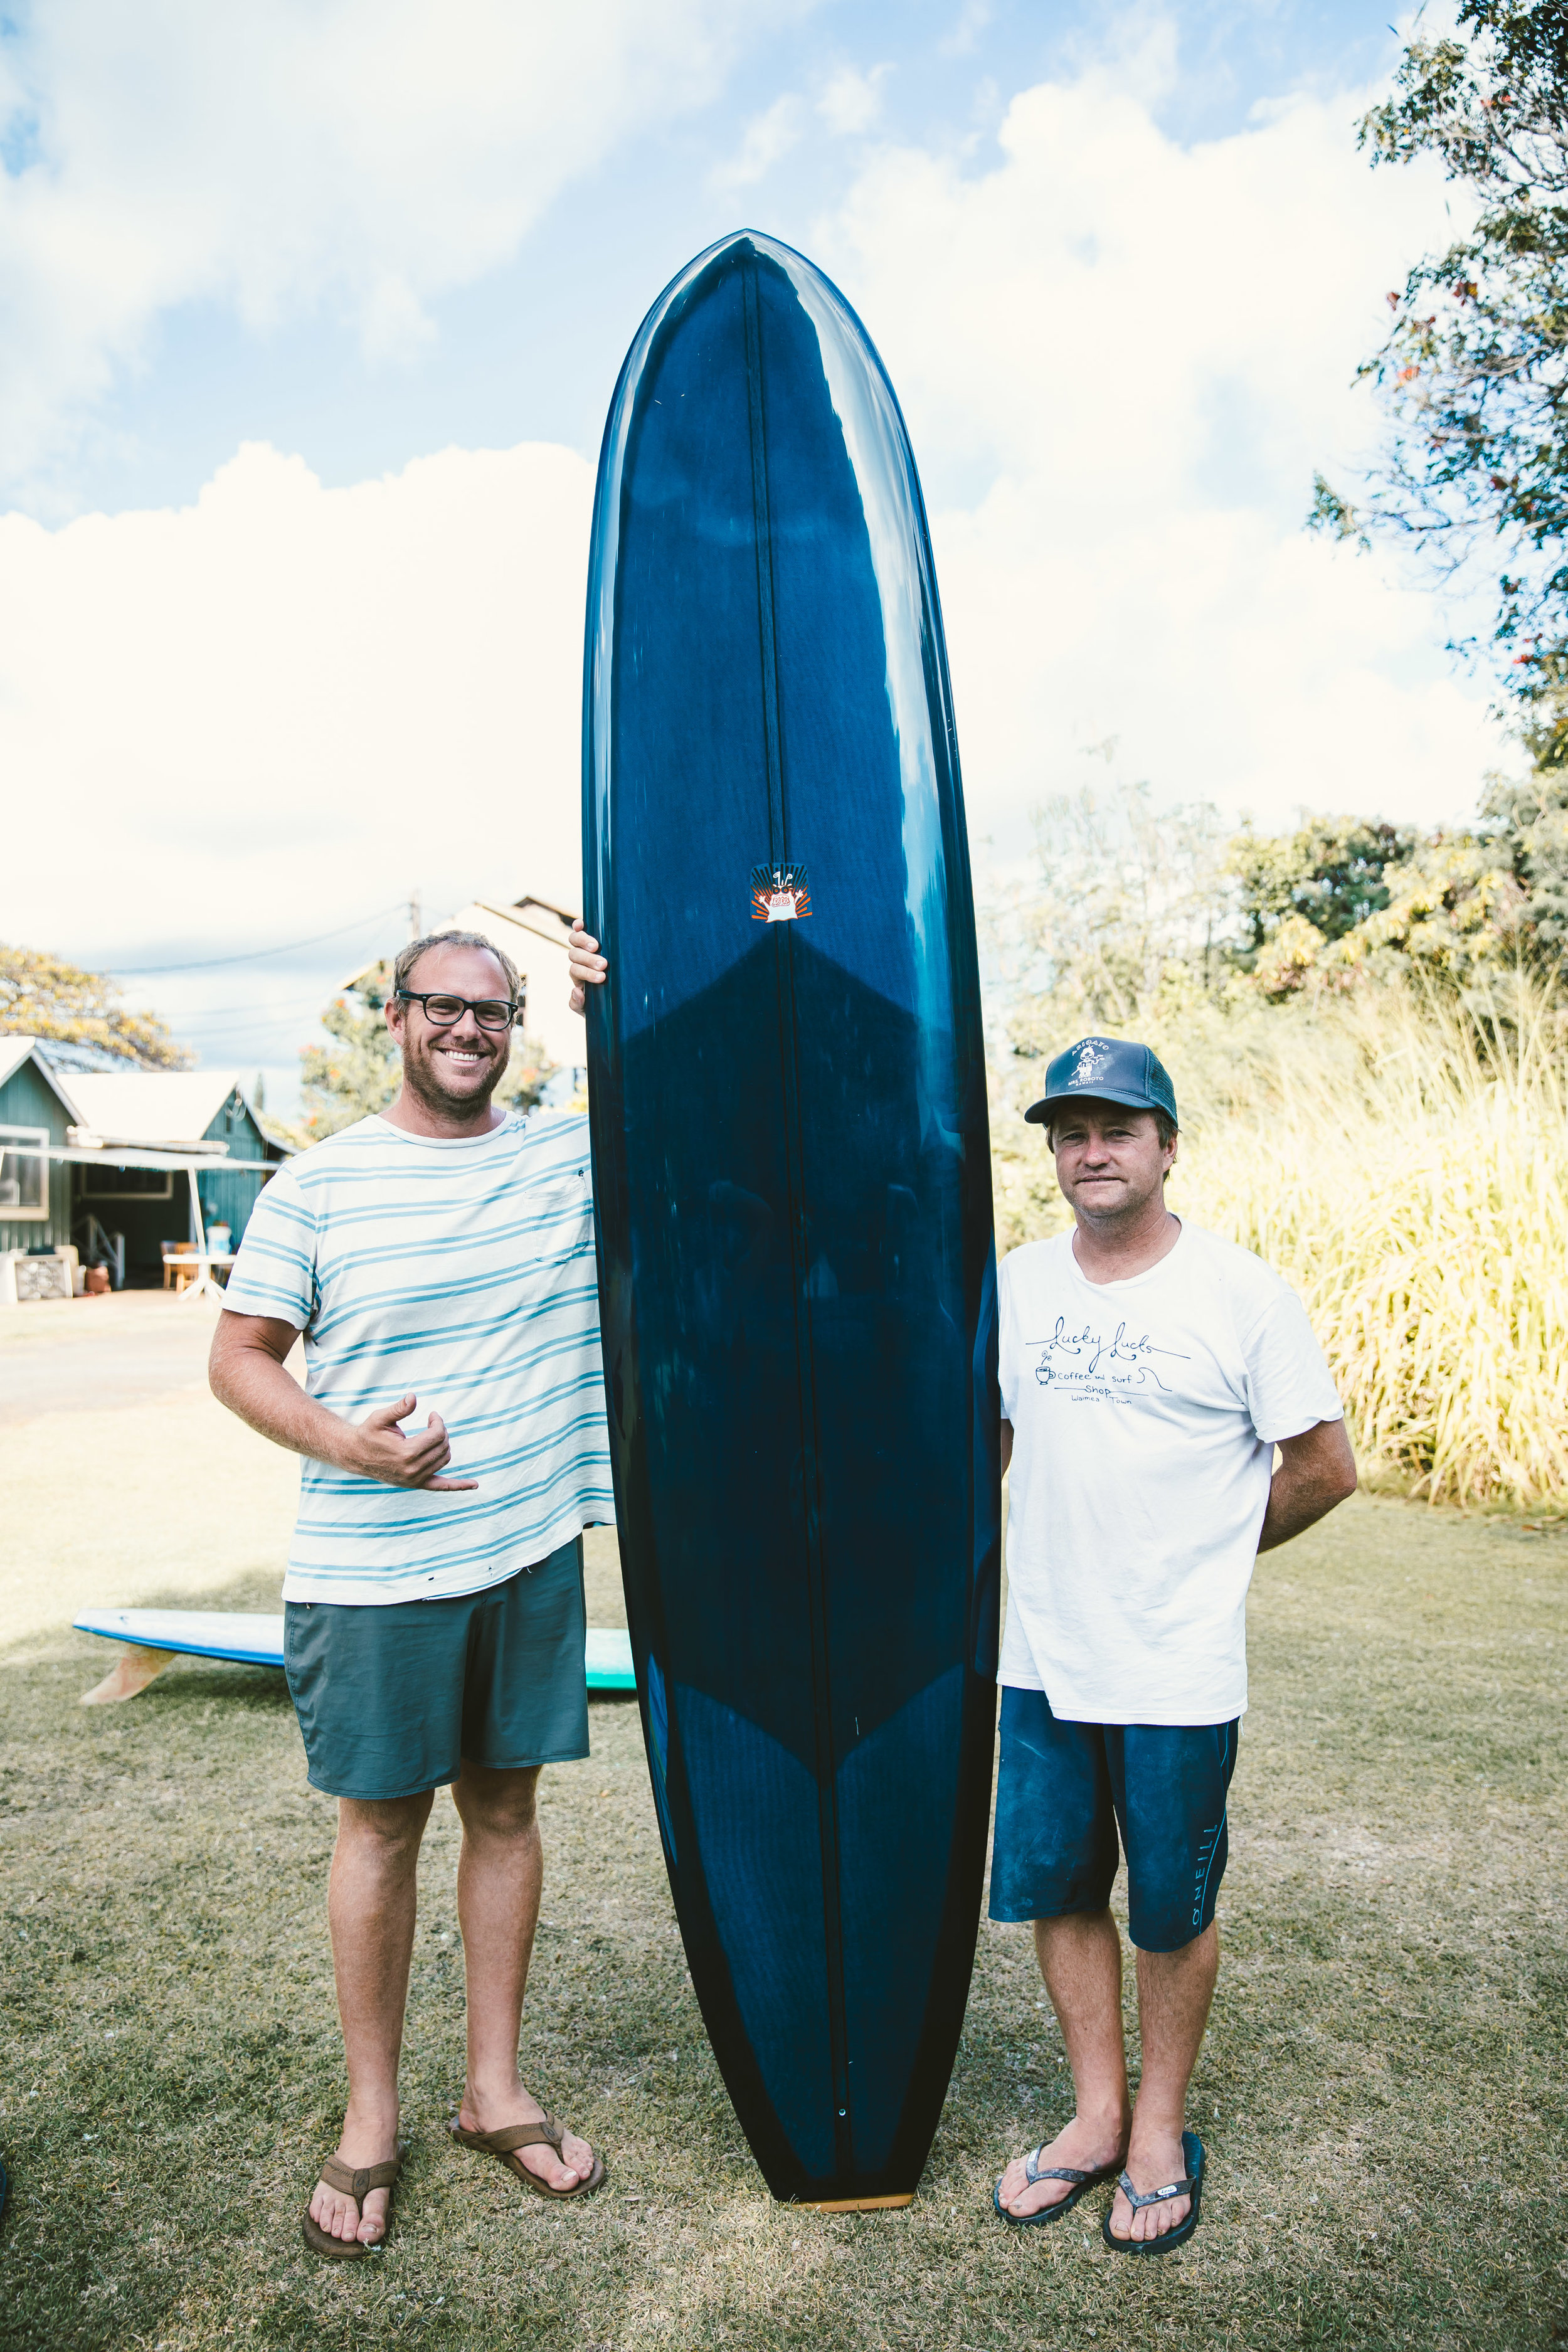 bryce johnson-photography-ebert surfboards-kauai-42.jpg